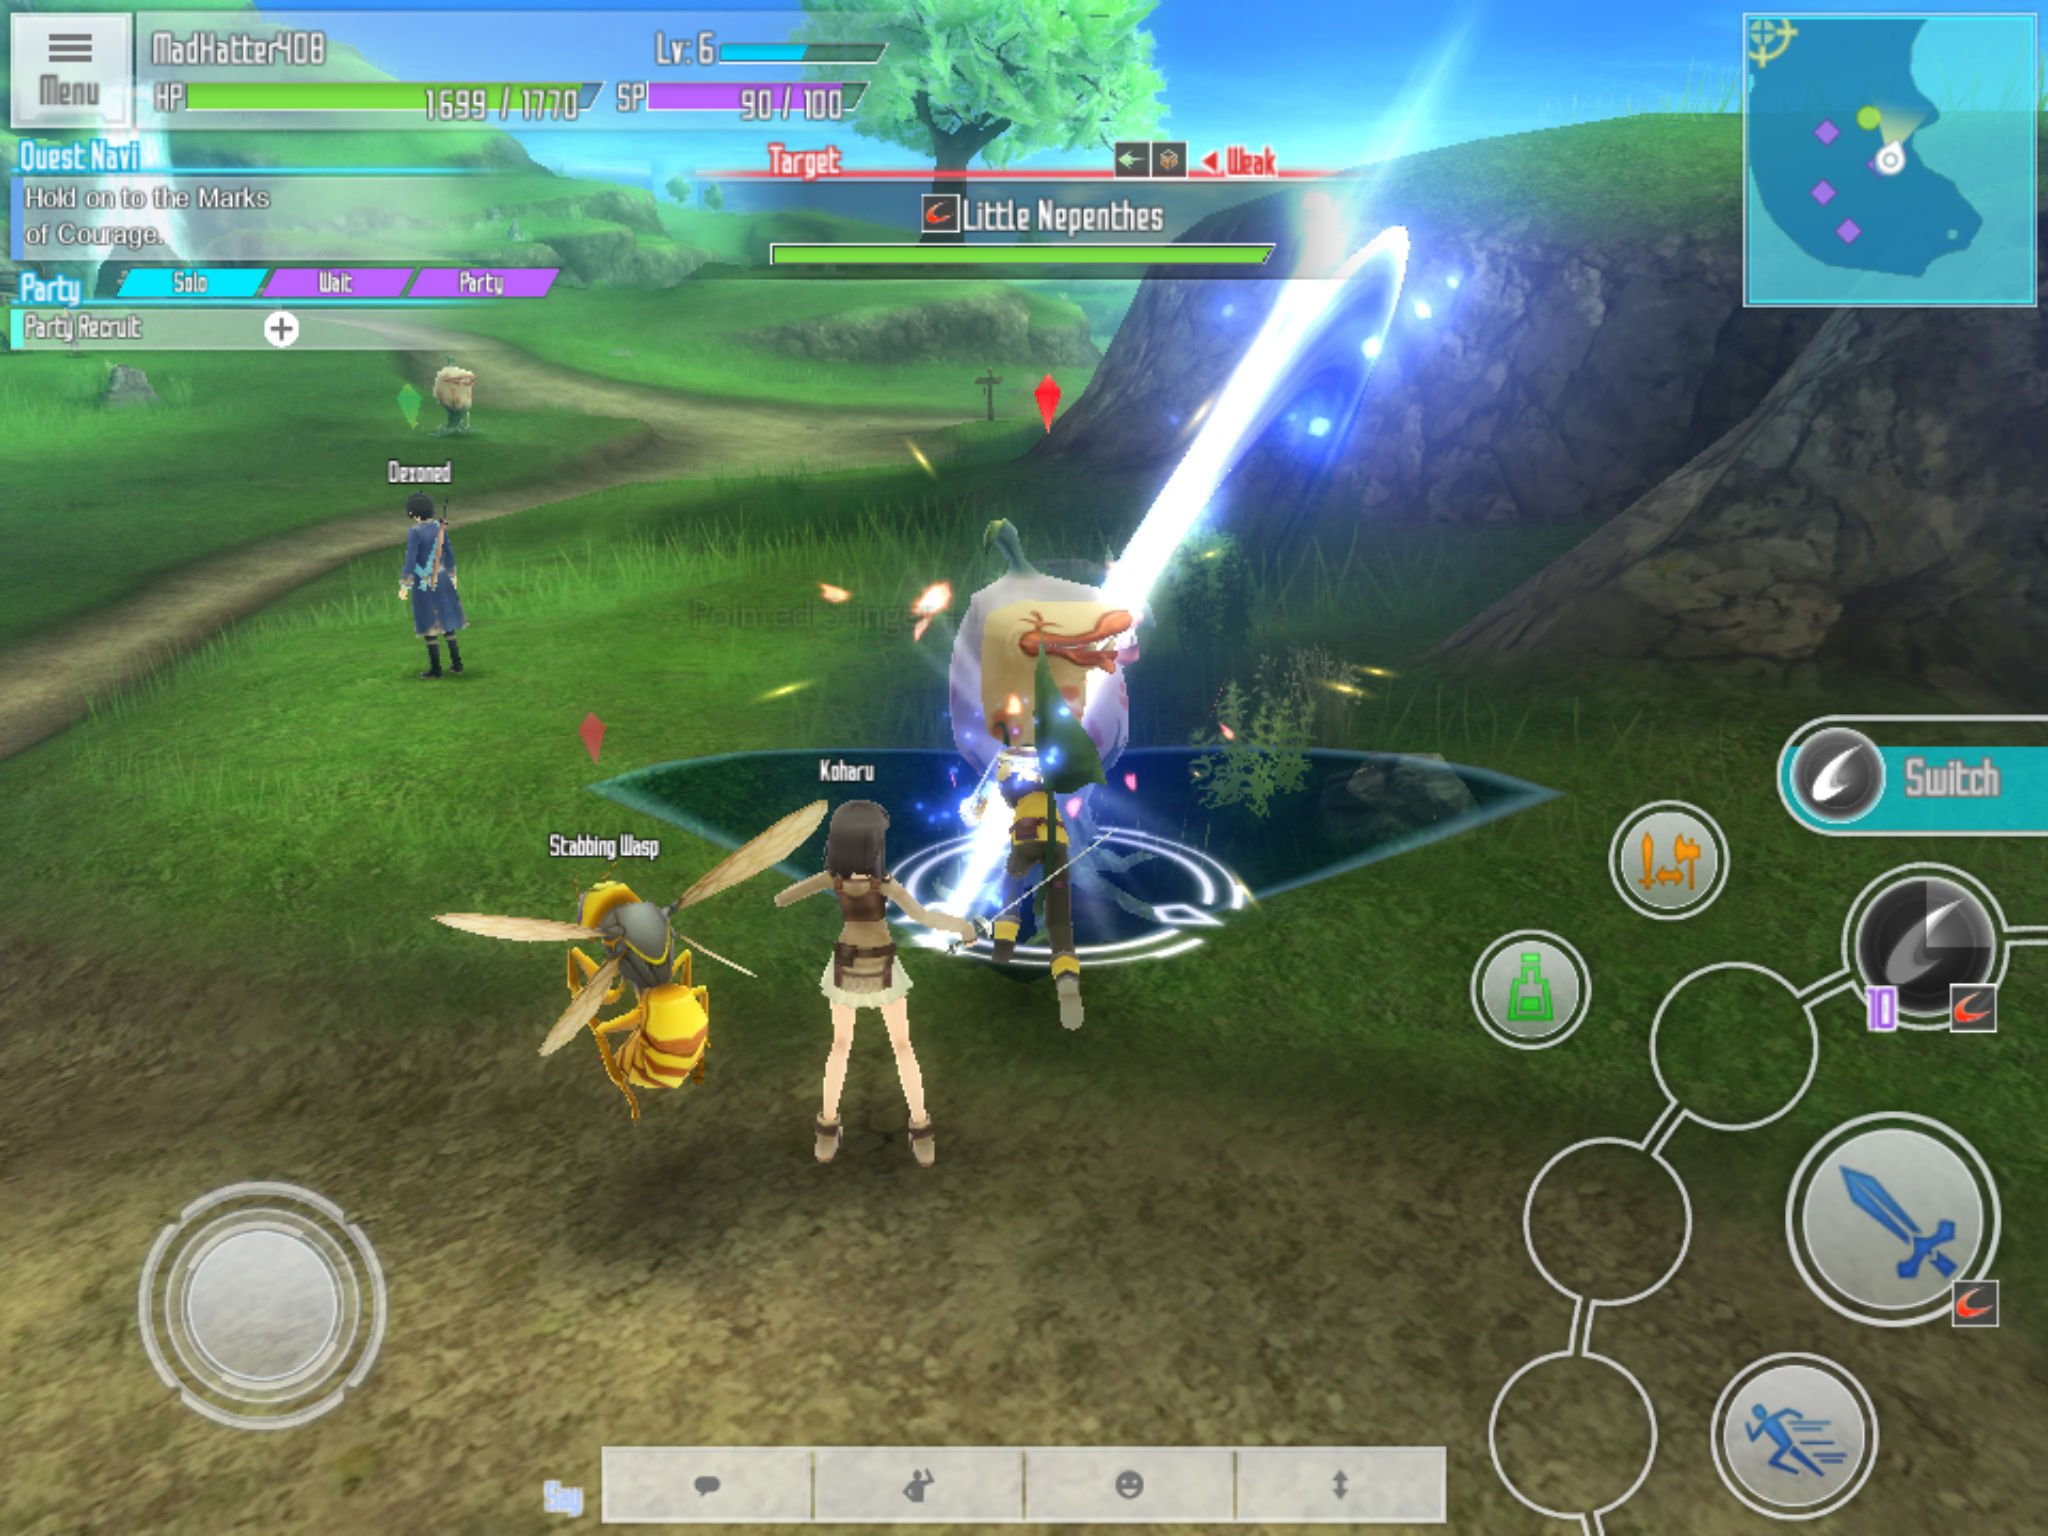 Sword Art Online: Integral Factor' Tips, Cheats and Hacks – TouchArcade